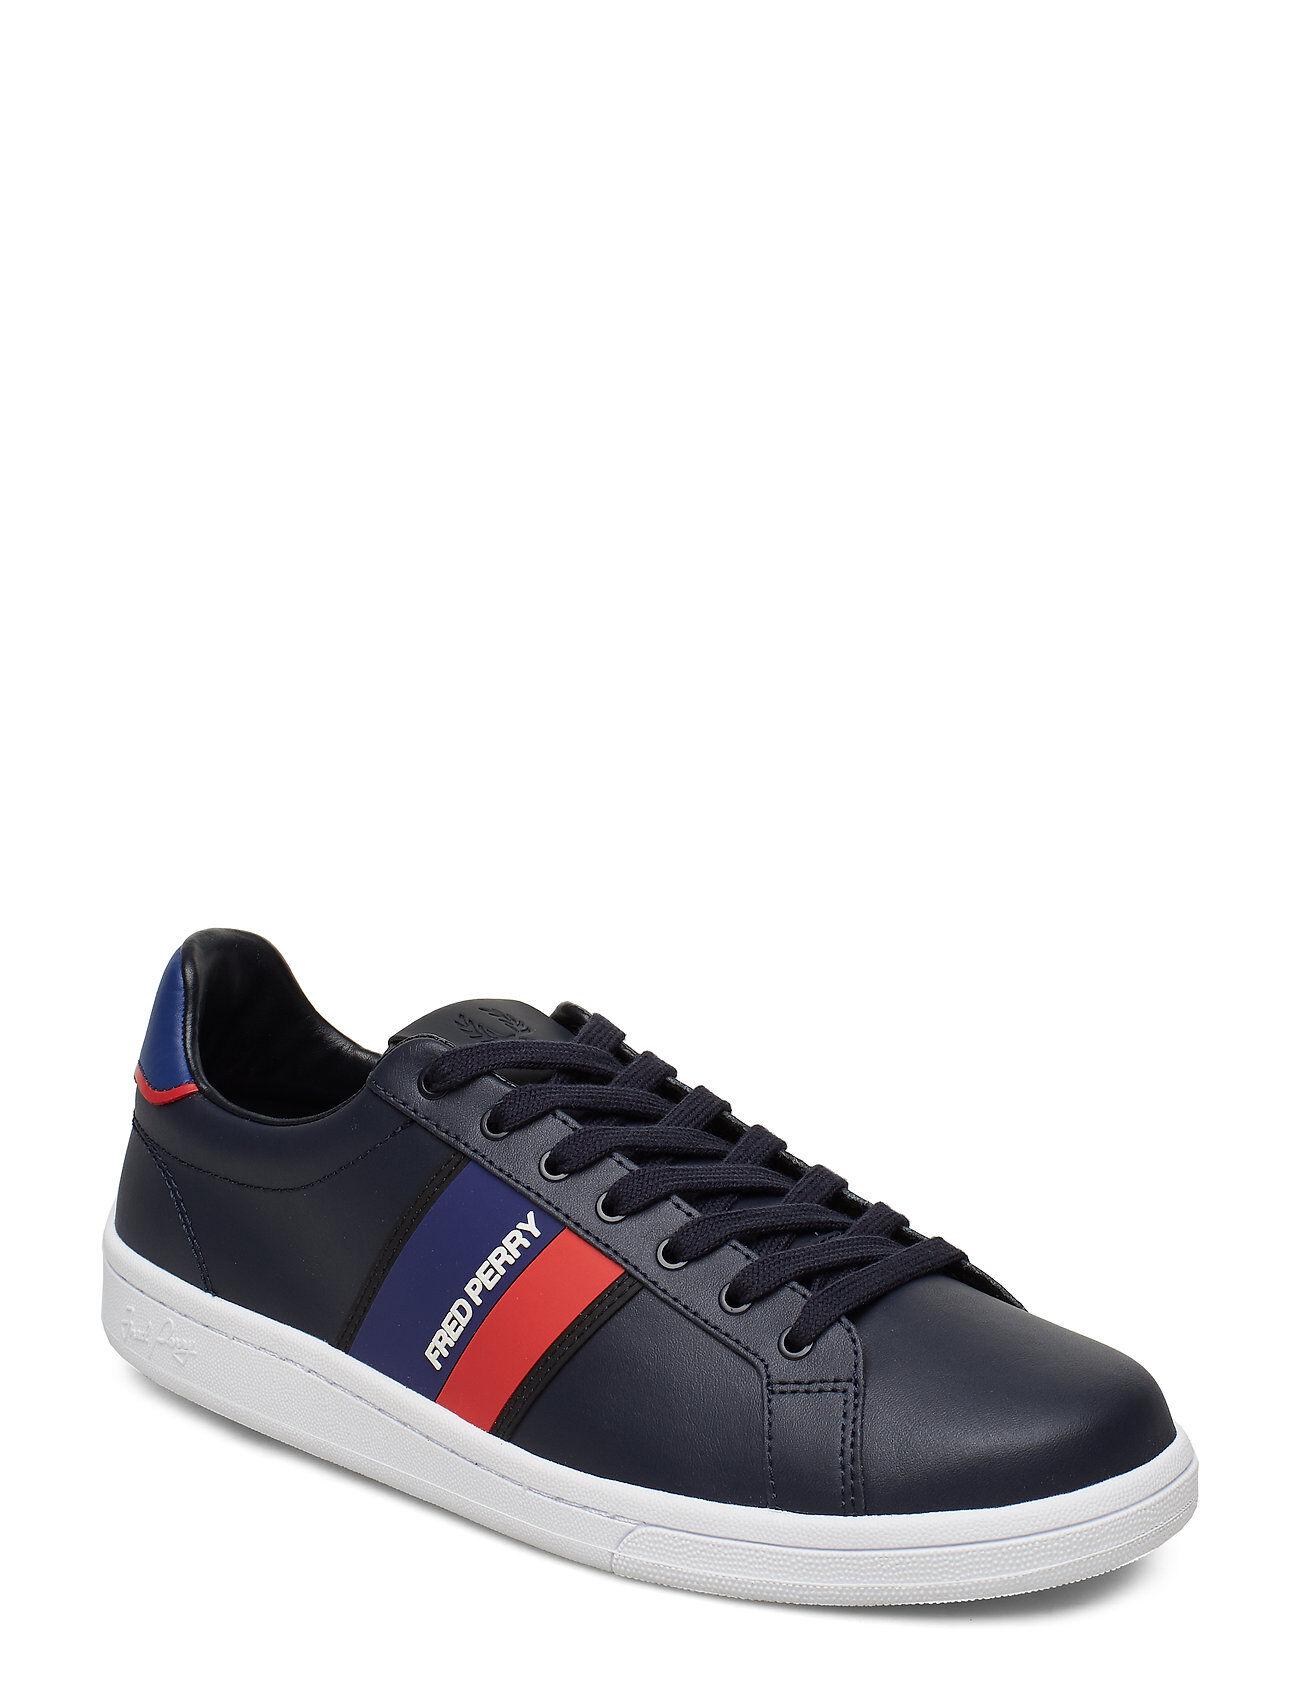 Fred Perry B721 Two T Brand. Matalavartiset Sneakerit Tennarit Sininen